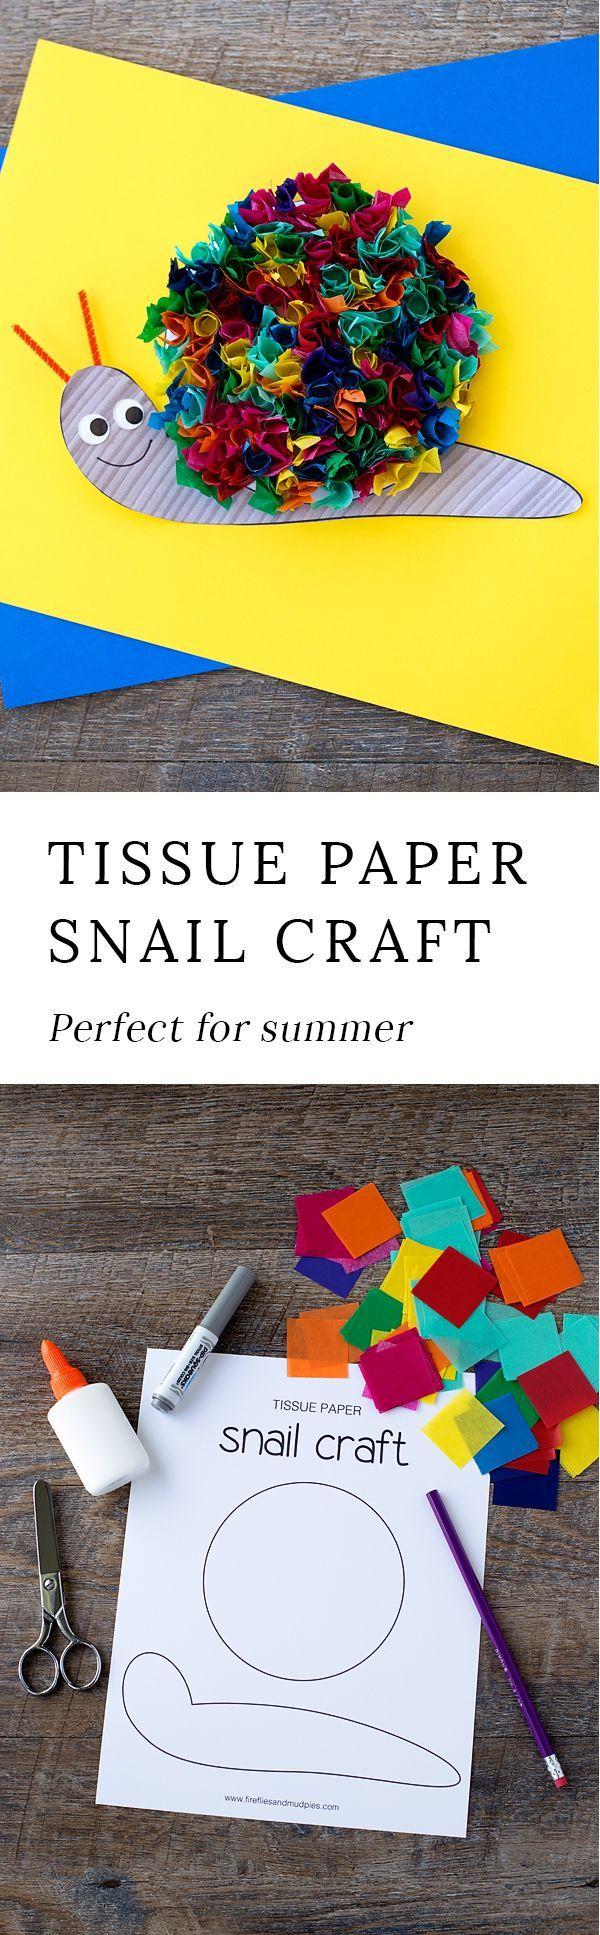 Bricolage tortue Maternelle Beau Photographie Rainbow Tissue Paper Snail Craft